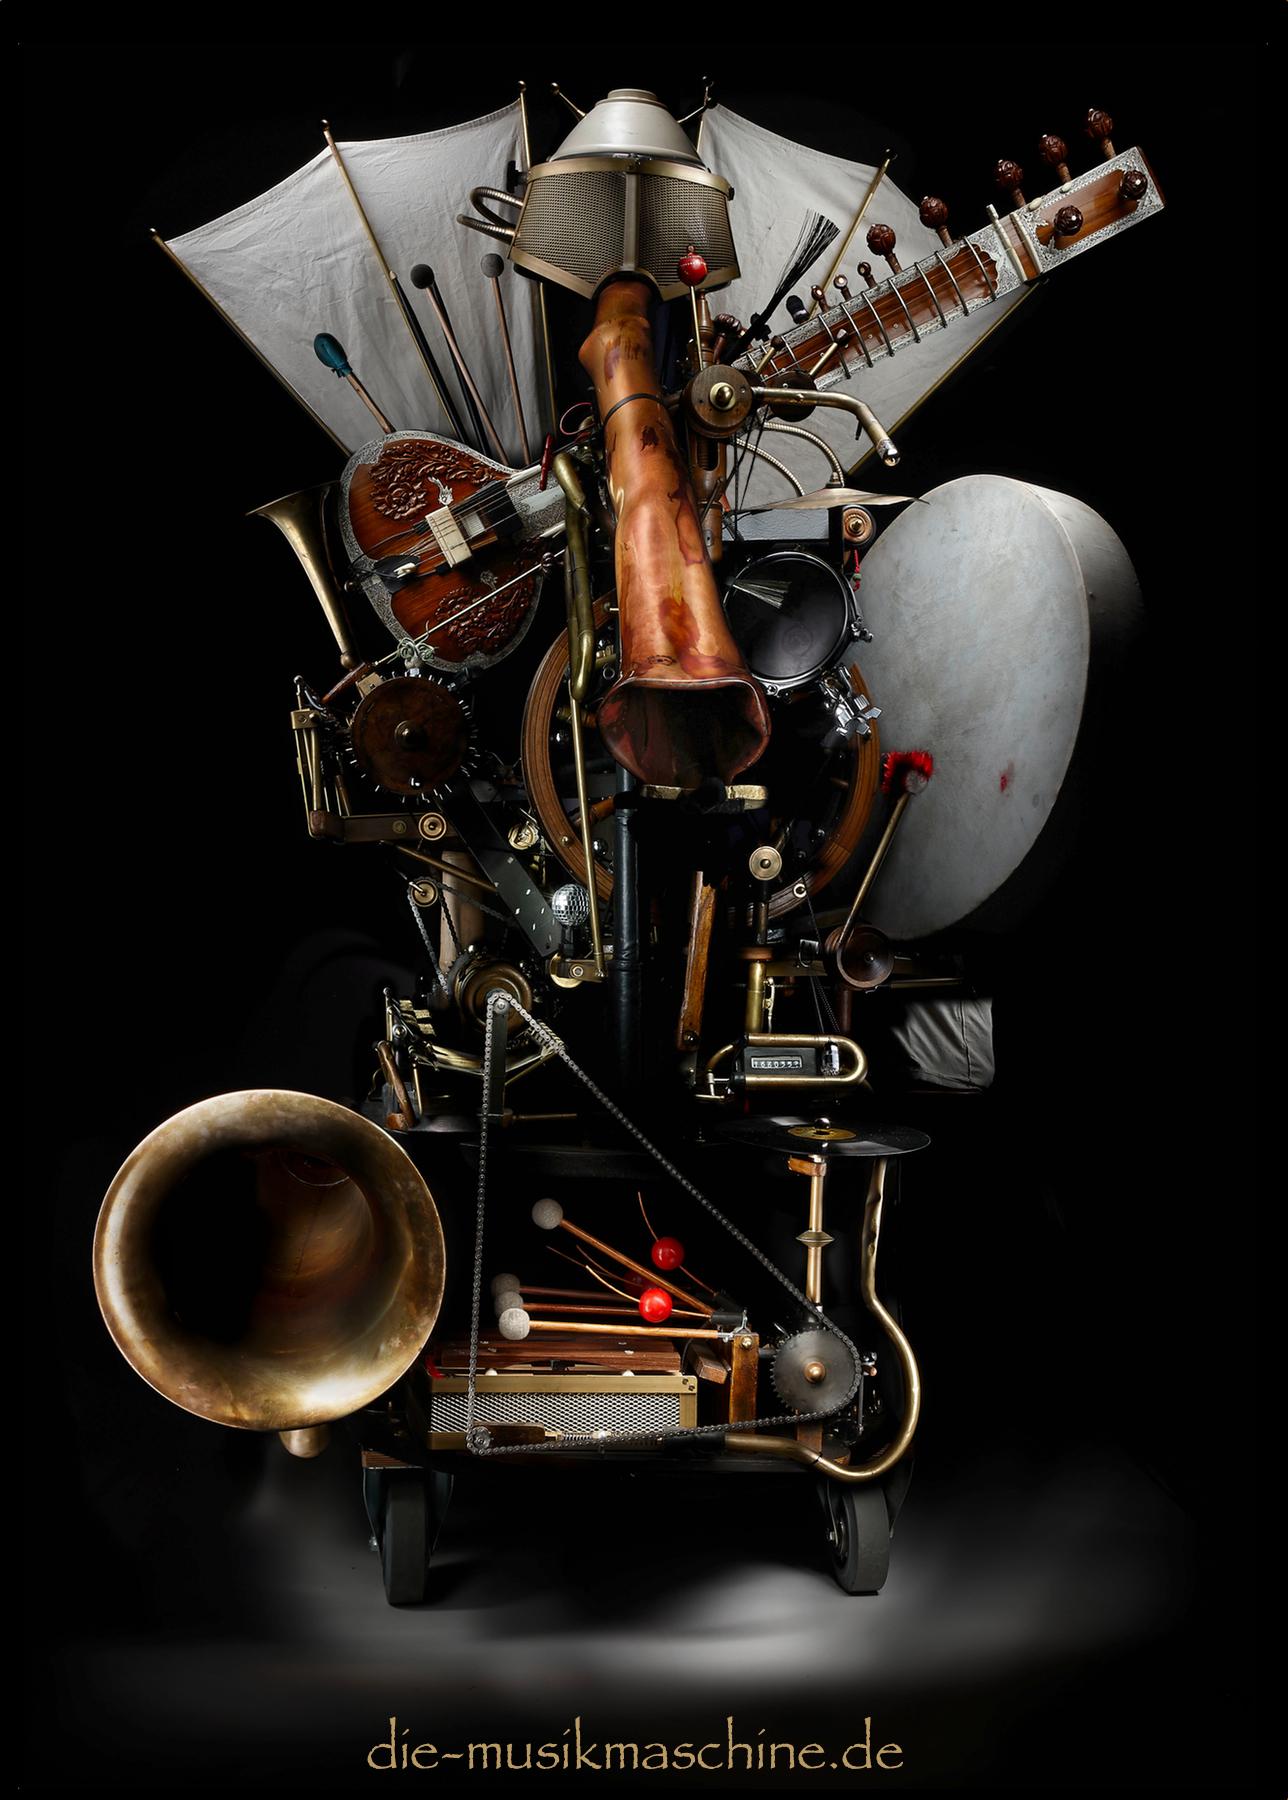 postcard music machine